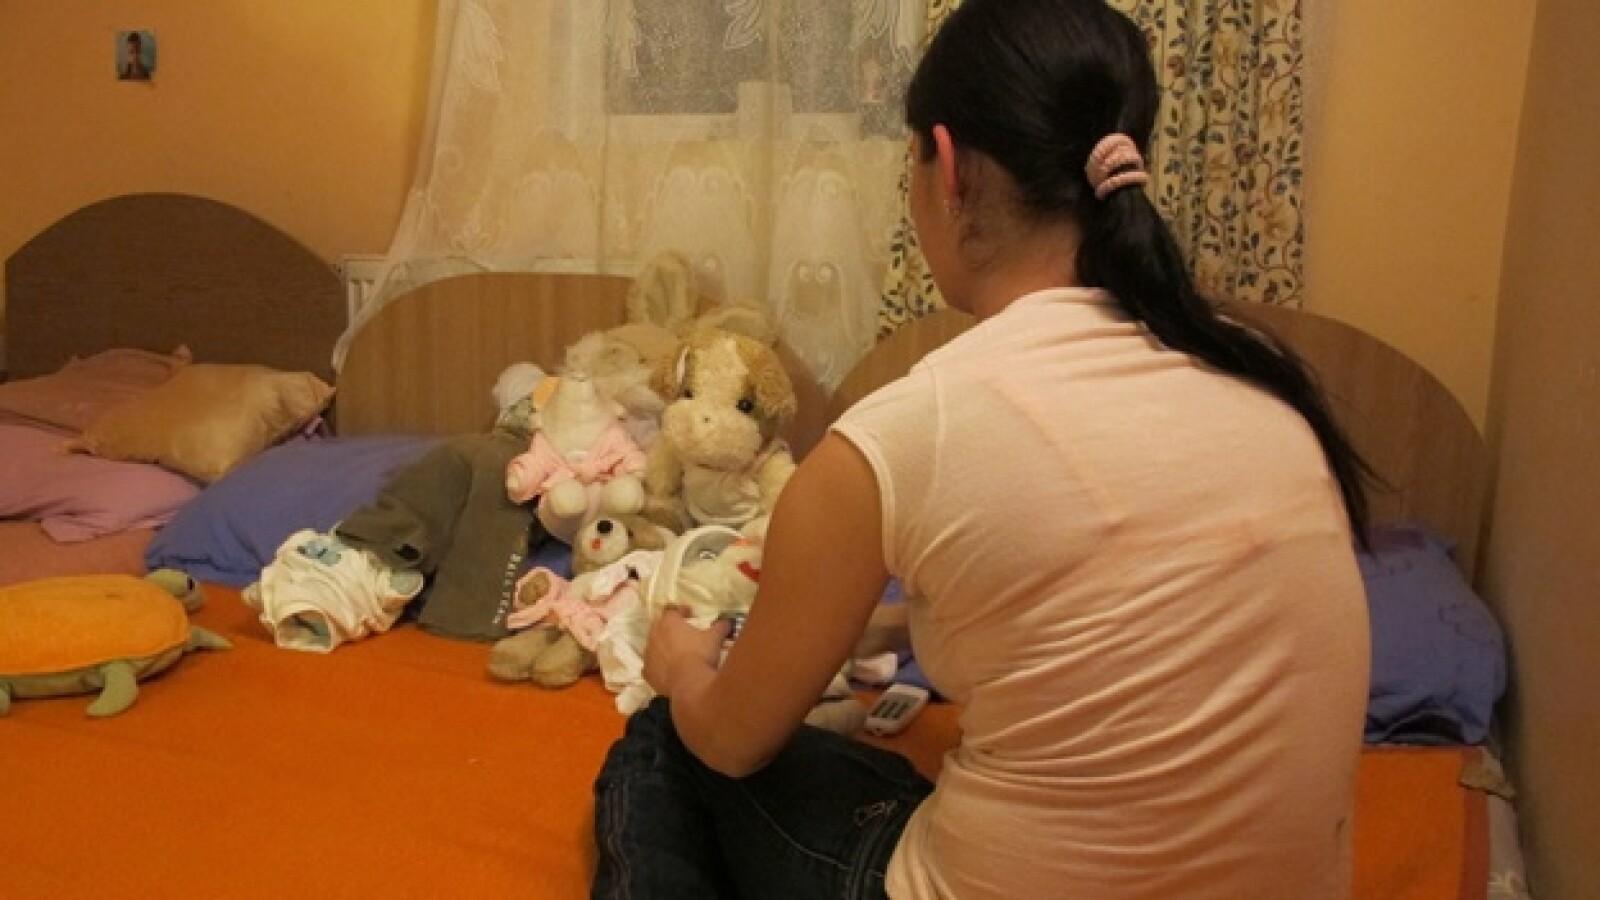 Rumania - trata de personas